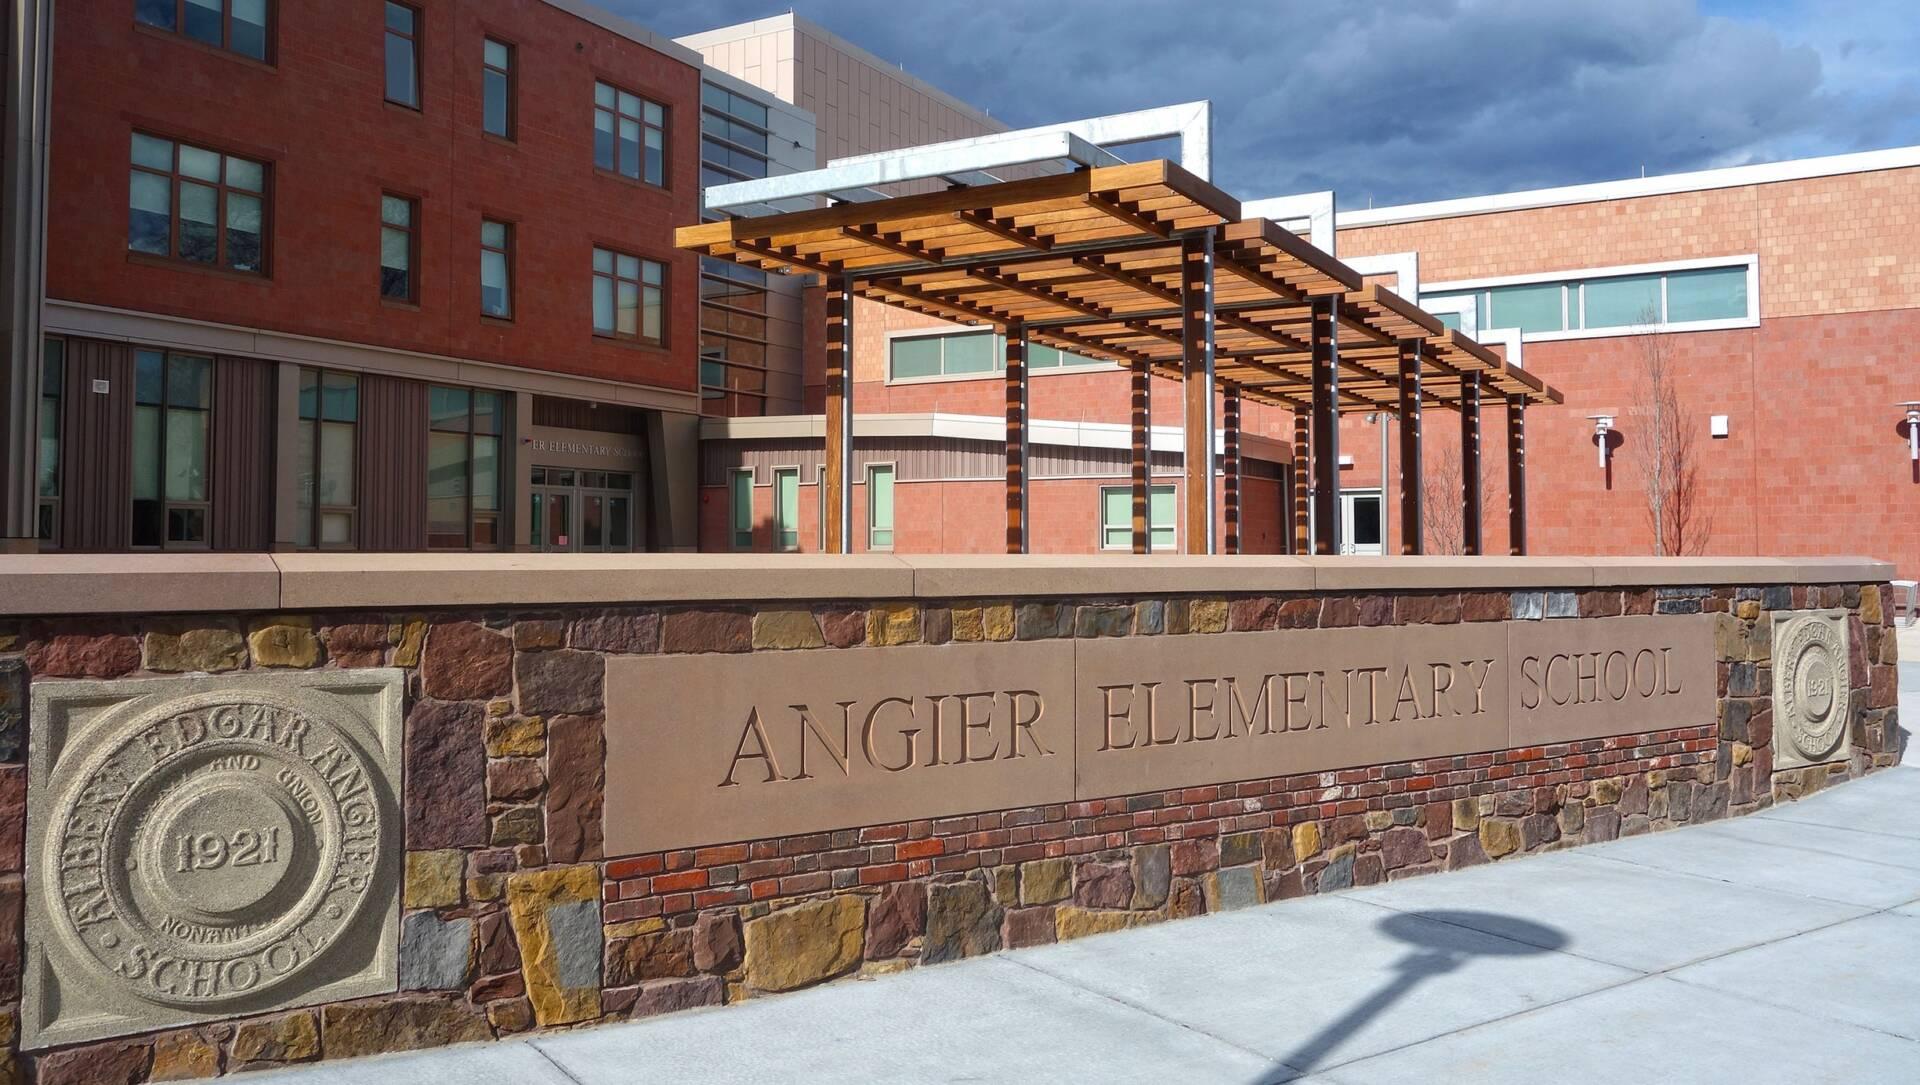 Angier Elementary School